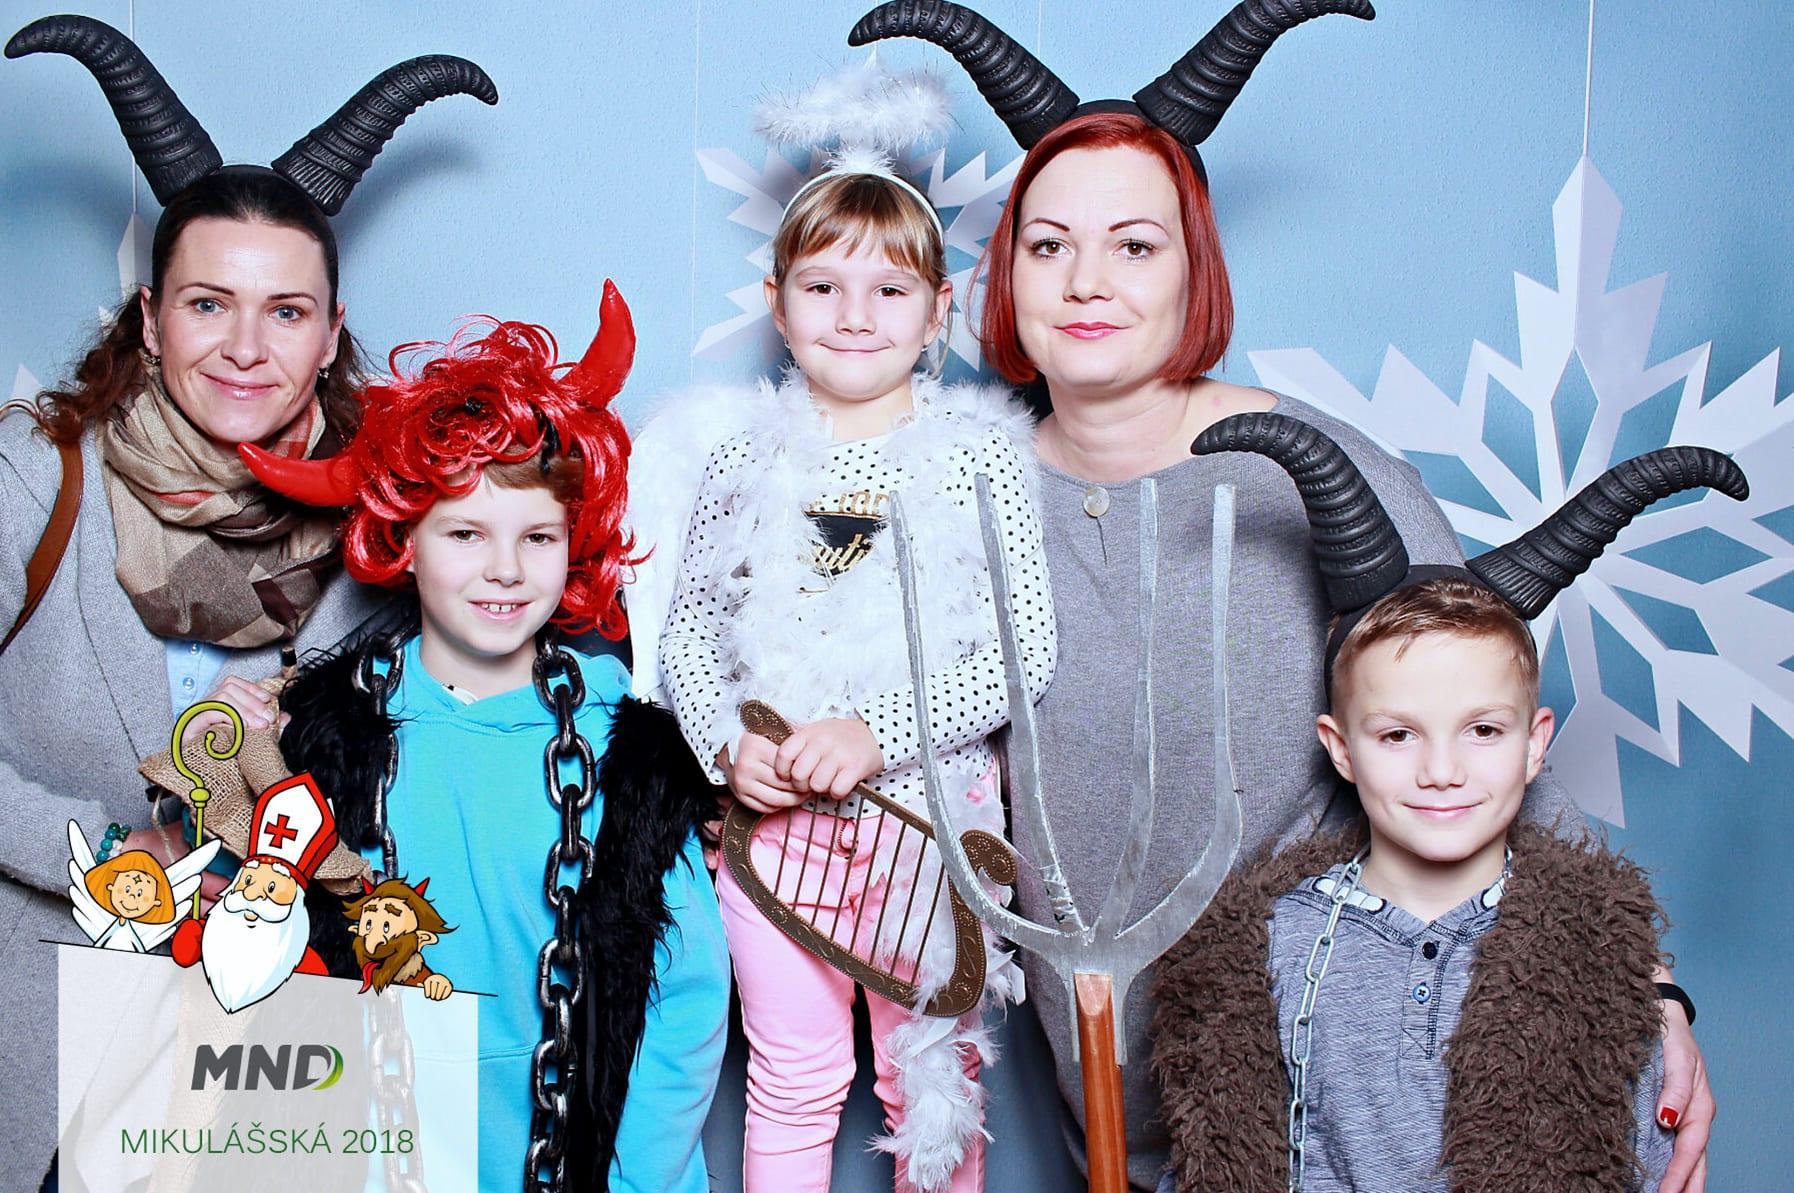 fotokoutek-mnd-mikulasska-4-12-2018-532056